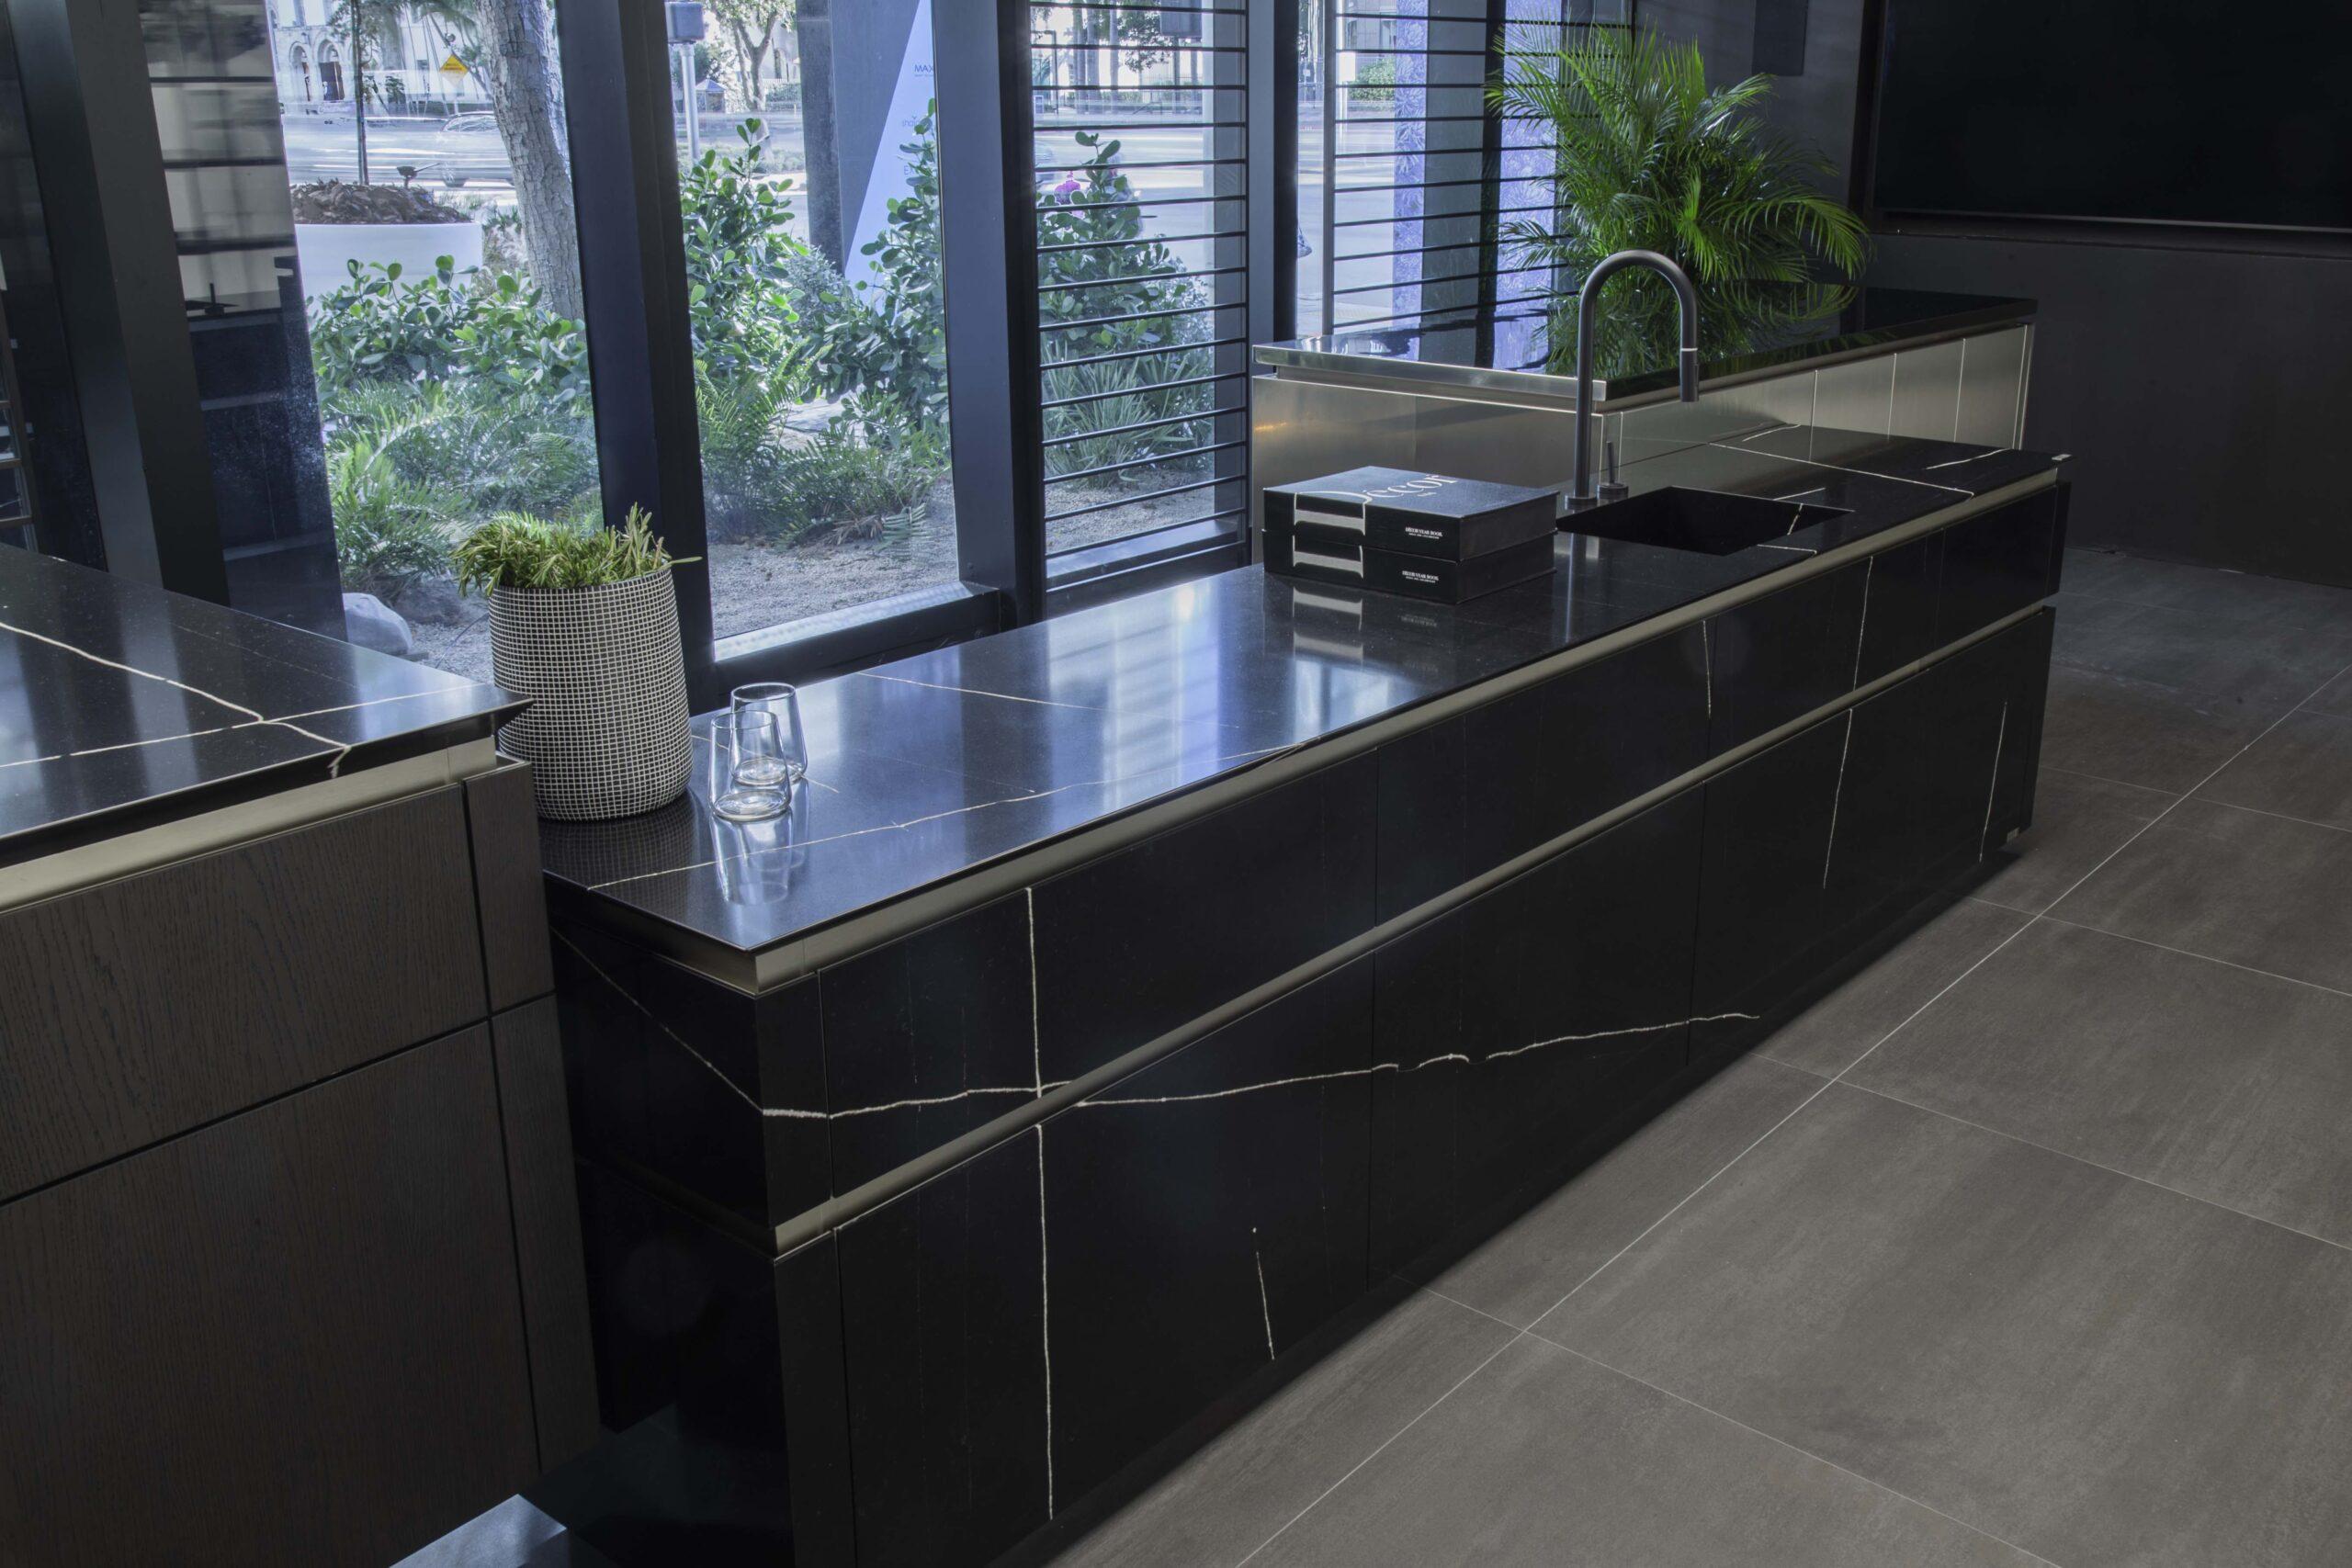 Image of Casacor Silestone Eternal Noir Kitchen YODEZEEN9 2 2 scaled in Cosentino returns to Miami Design Week 2019 - Cosentino